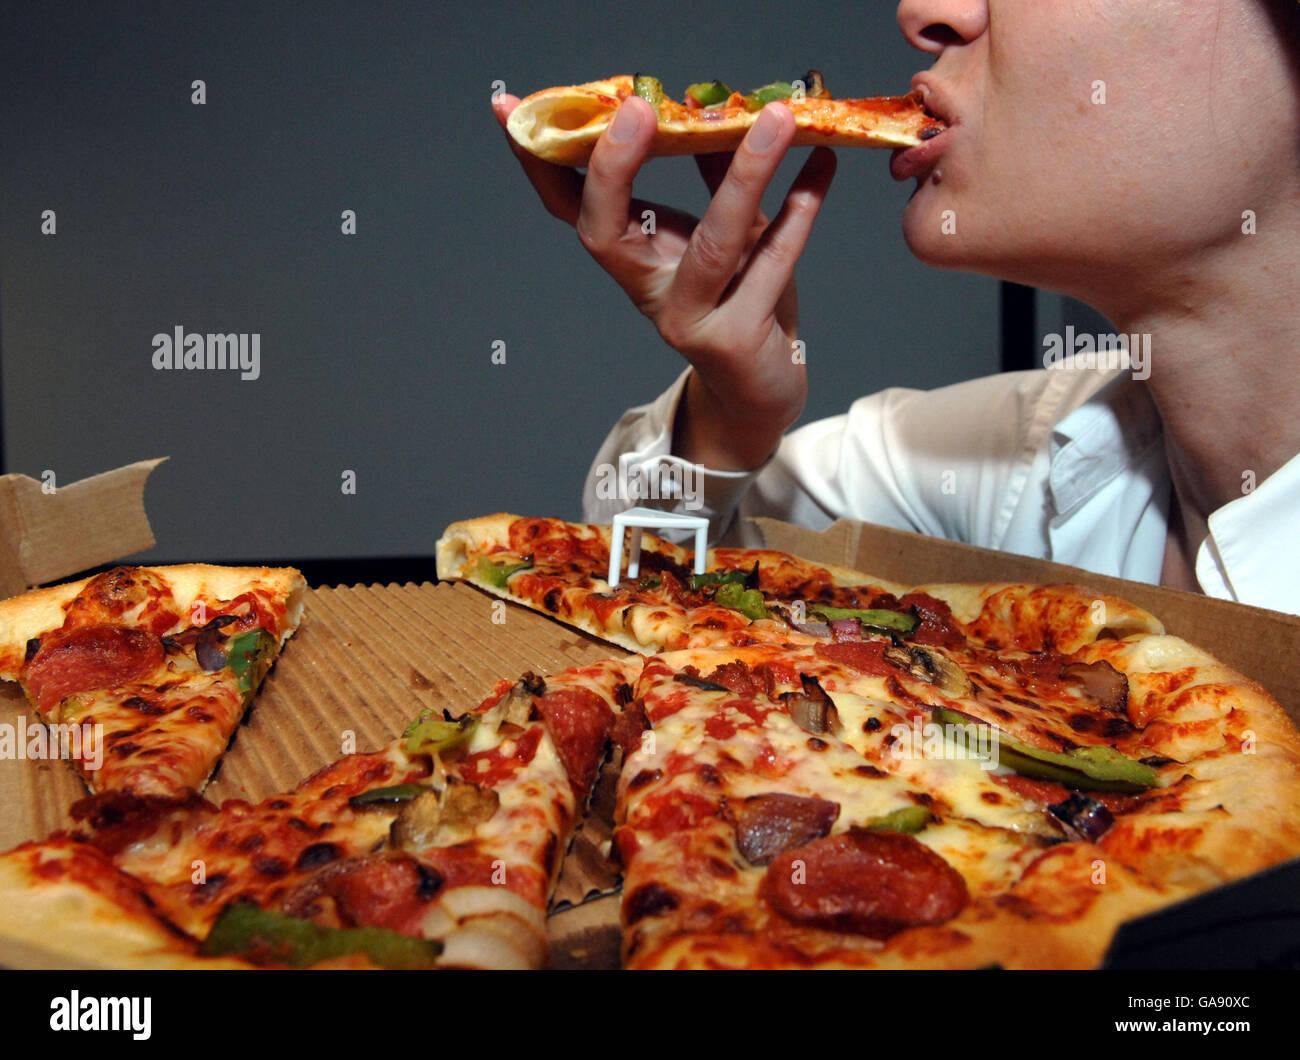 Pizza Hut Stock Stock Photo 109607076 Alamy